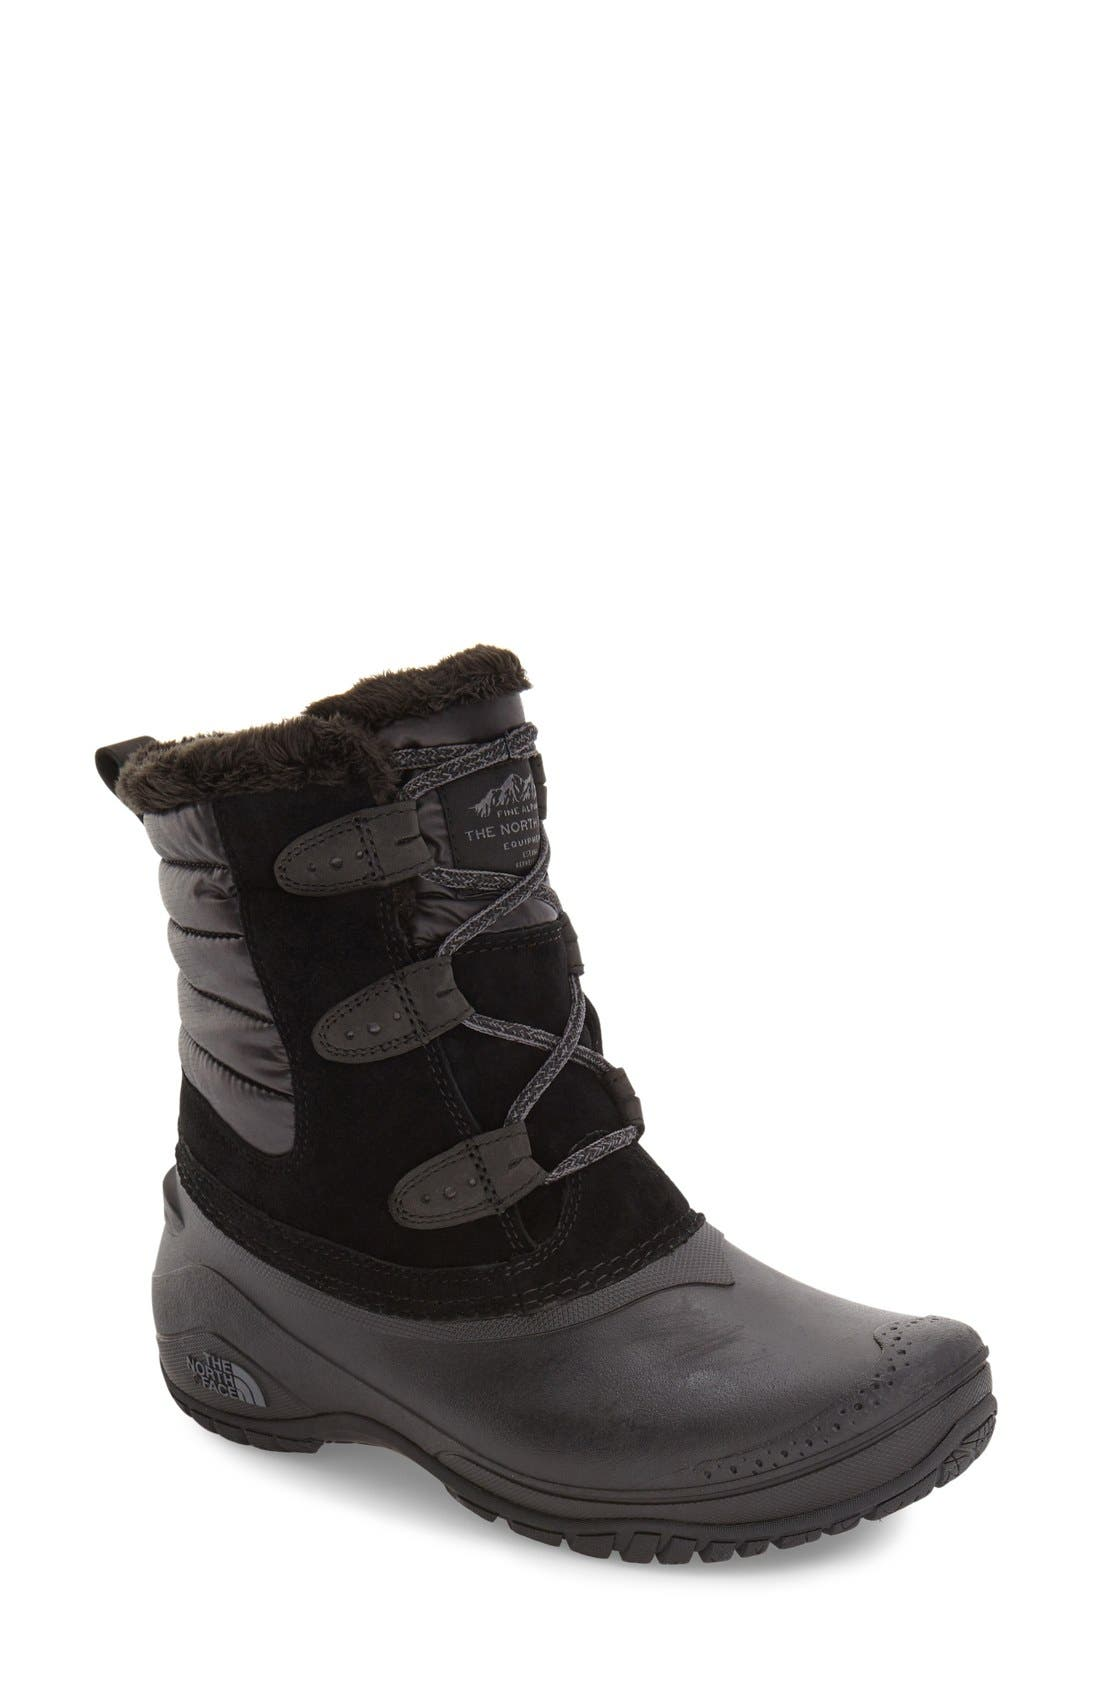 Shellista II Waterproof Boot,                         Main,                         color, BLACK/ SMOKED PEARL GREY